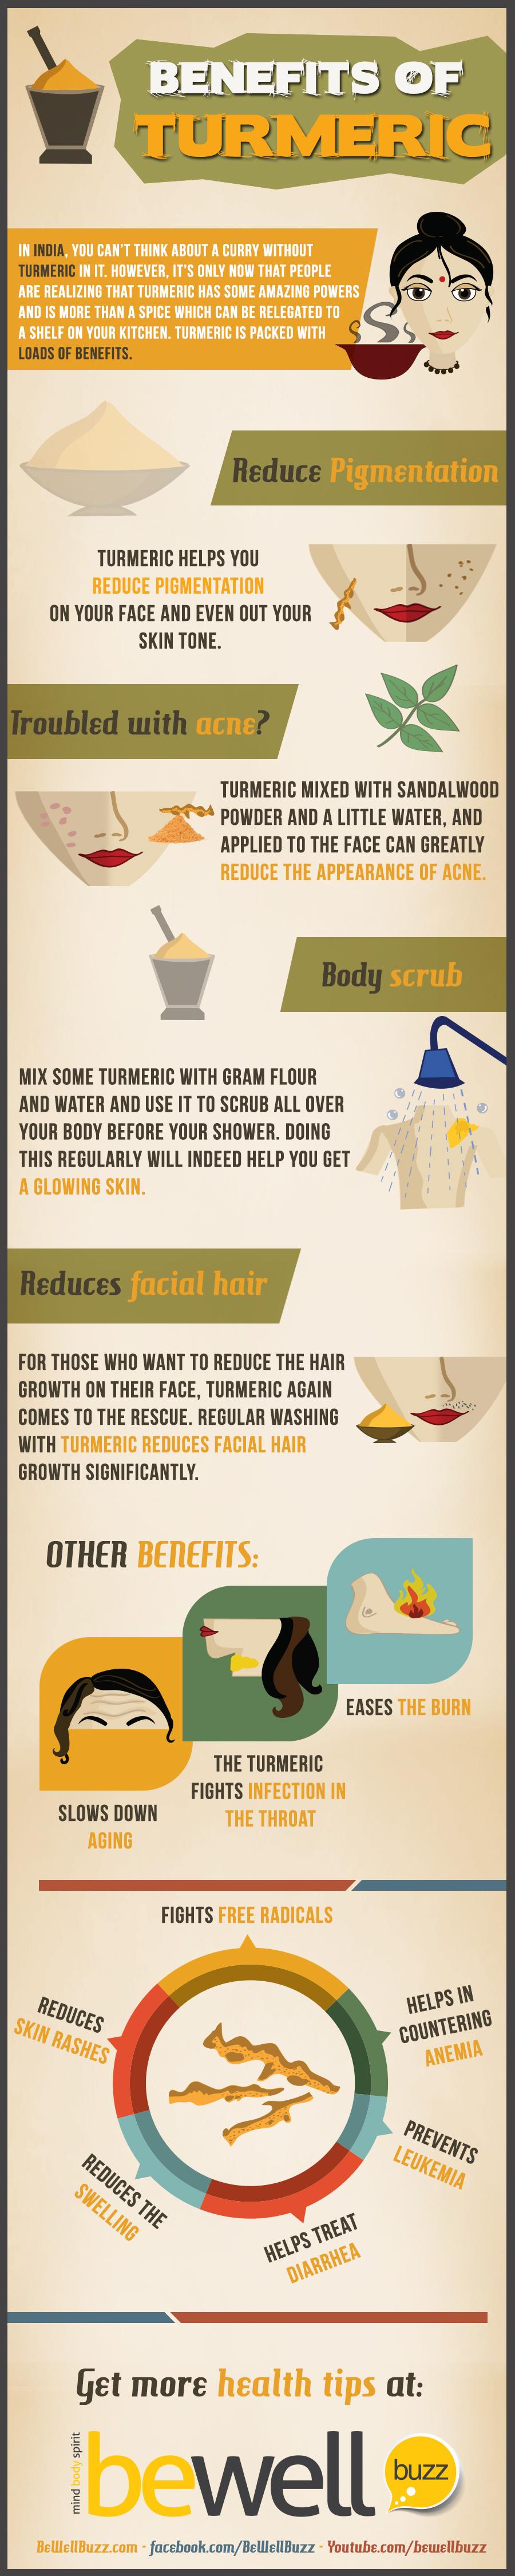 How Turmeric Benefits You - Infographic